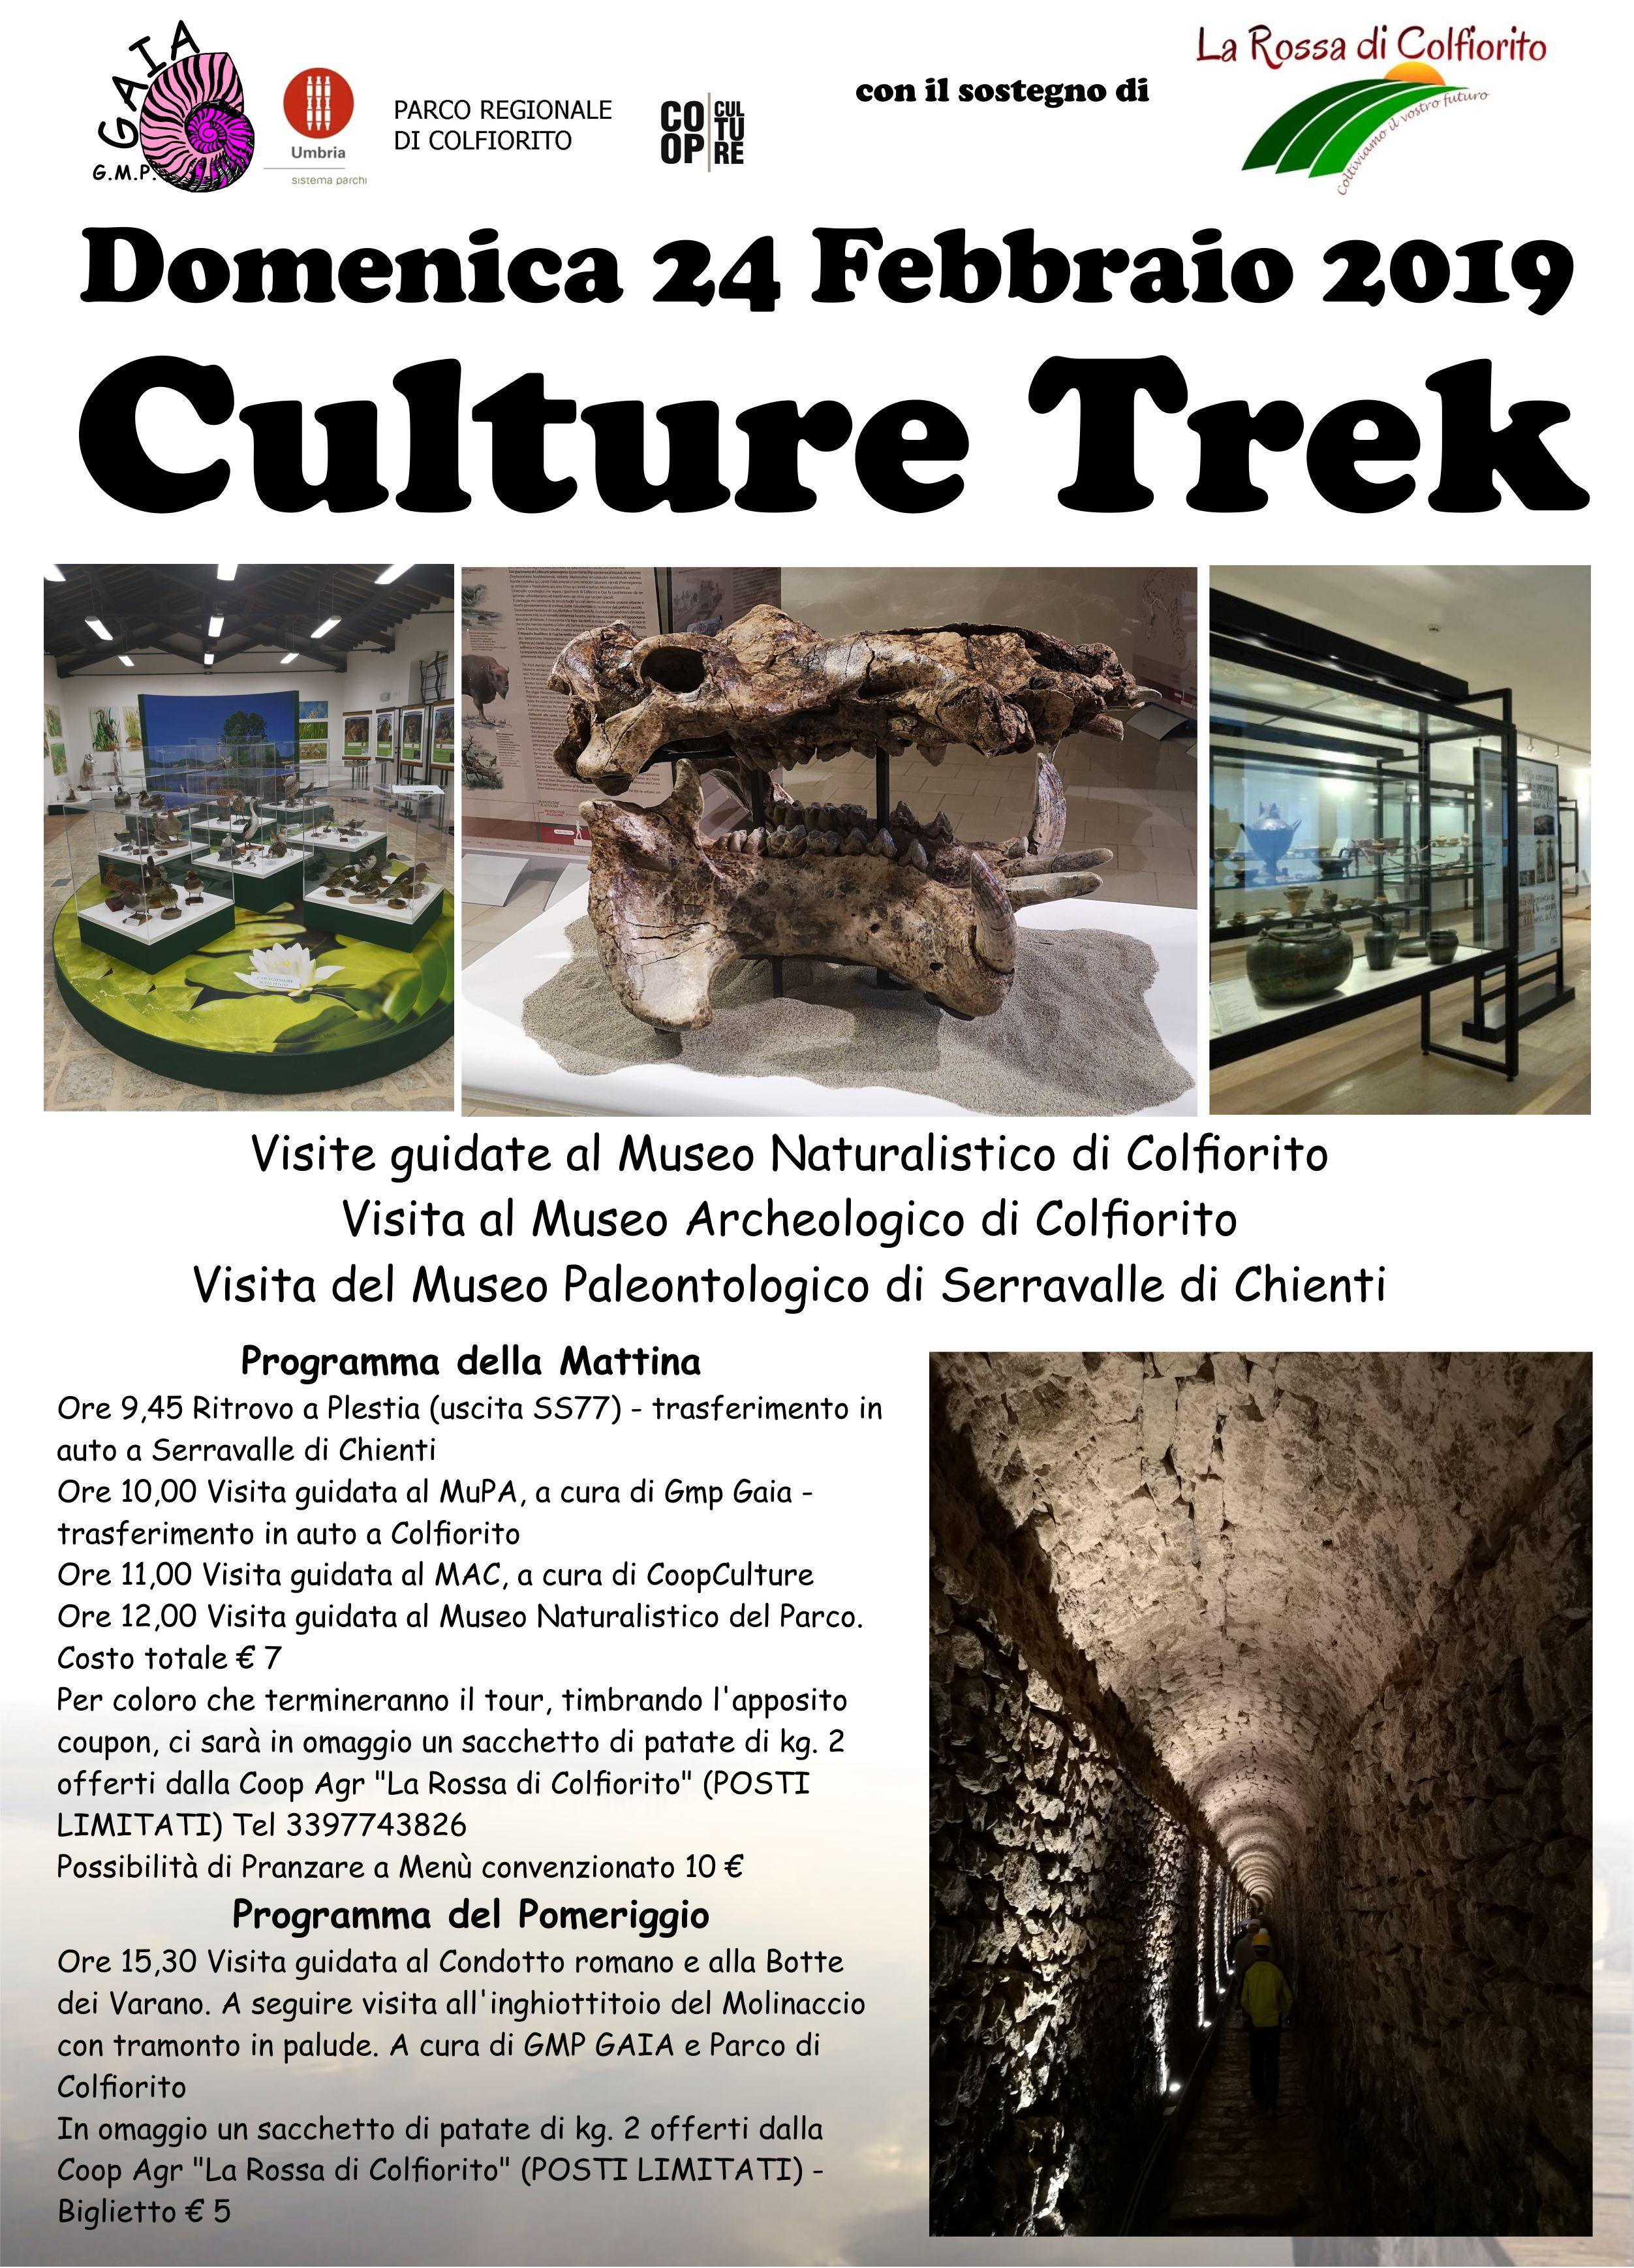 Culture Trek